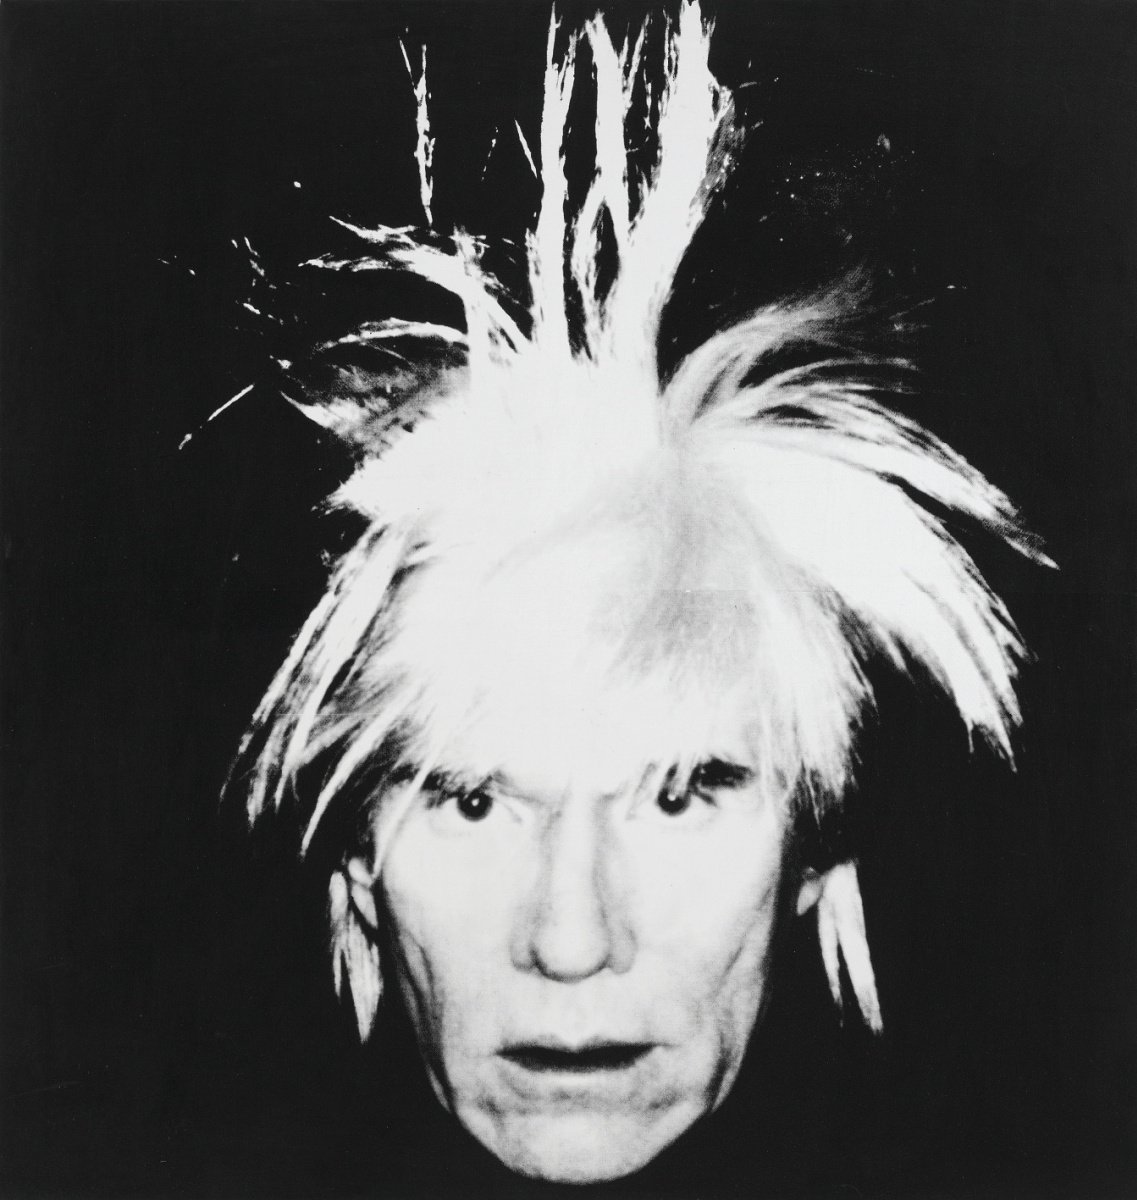 Andy Warhol. Self portrait (hair on end)